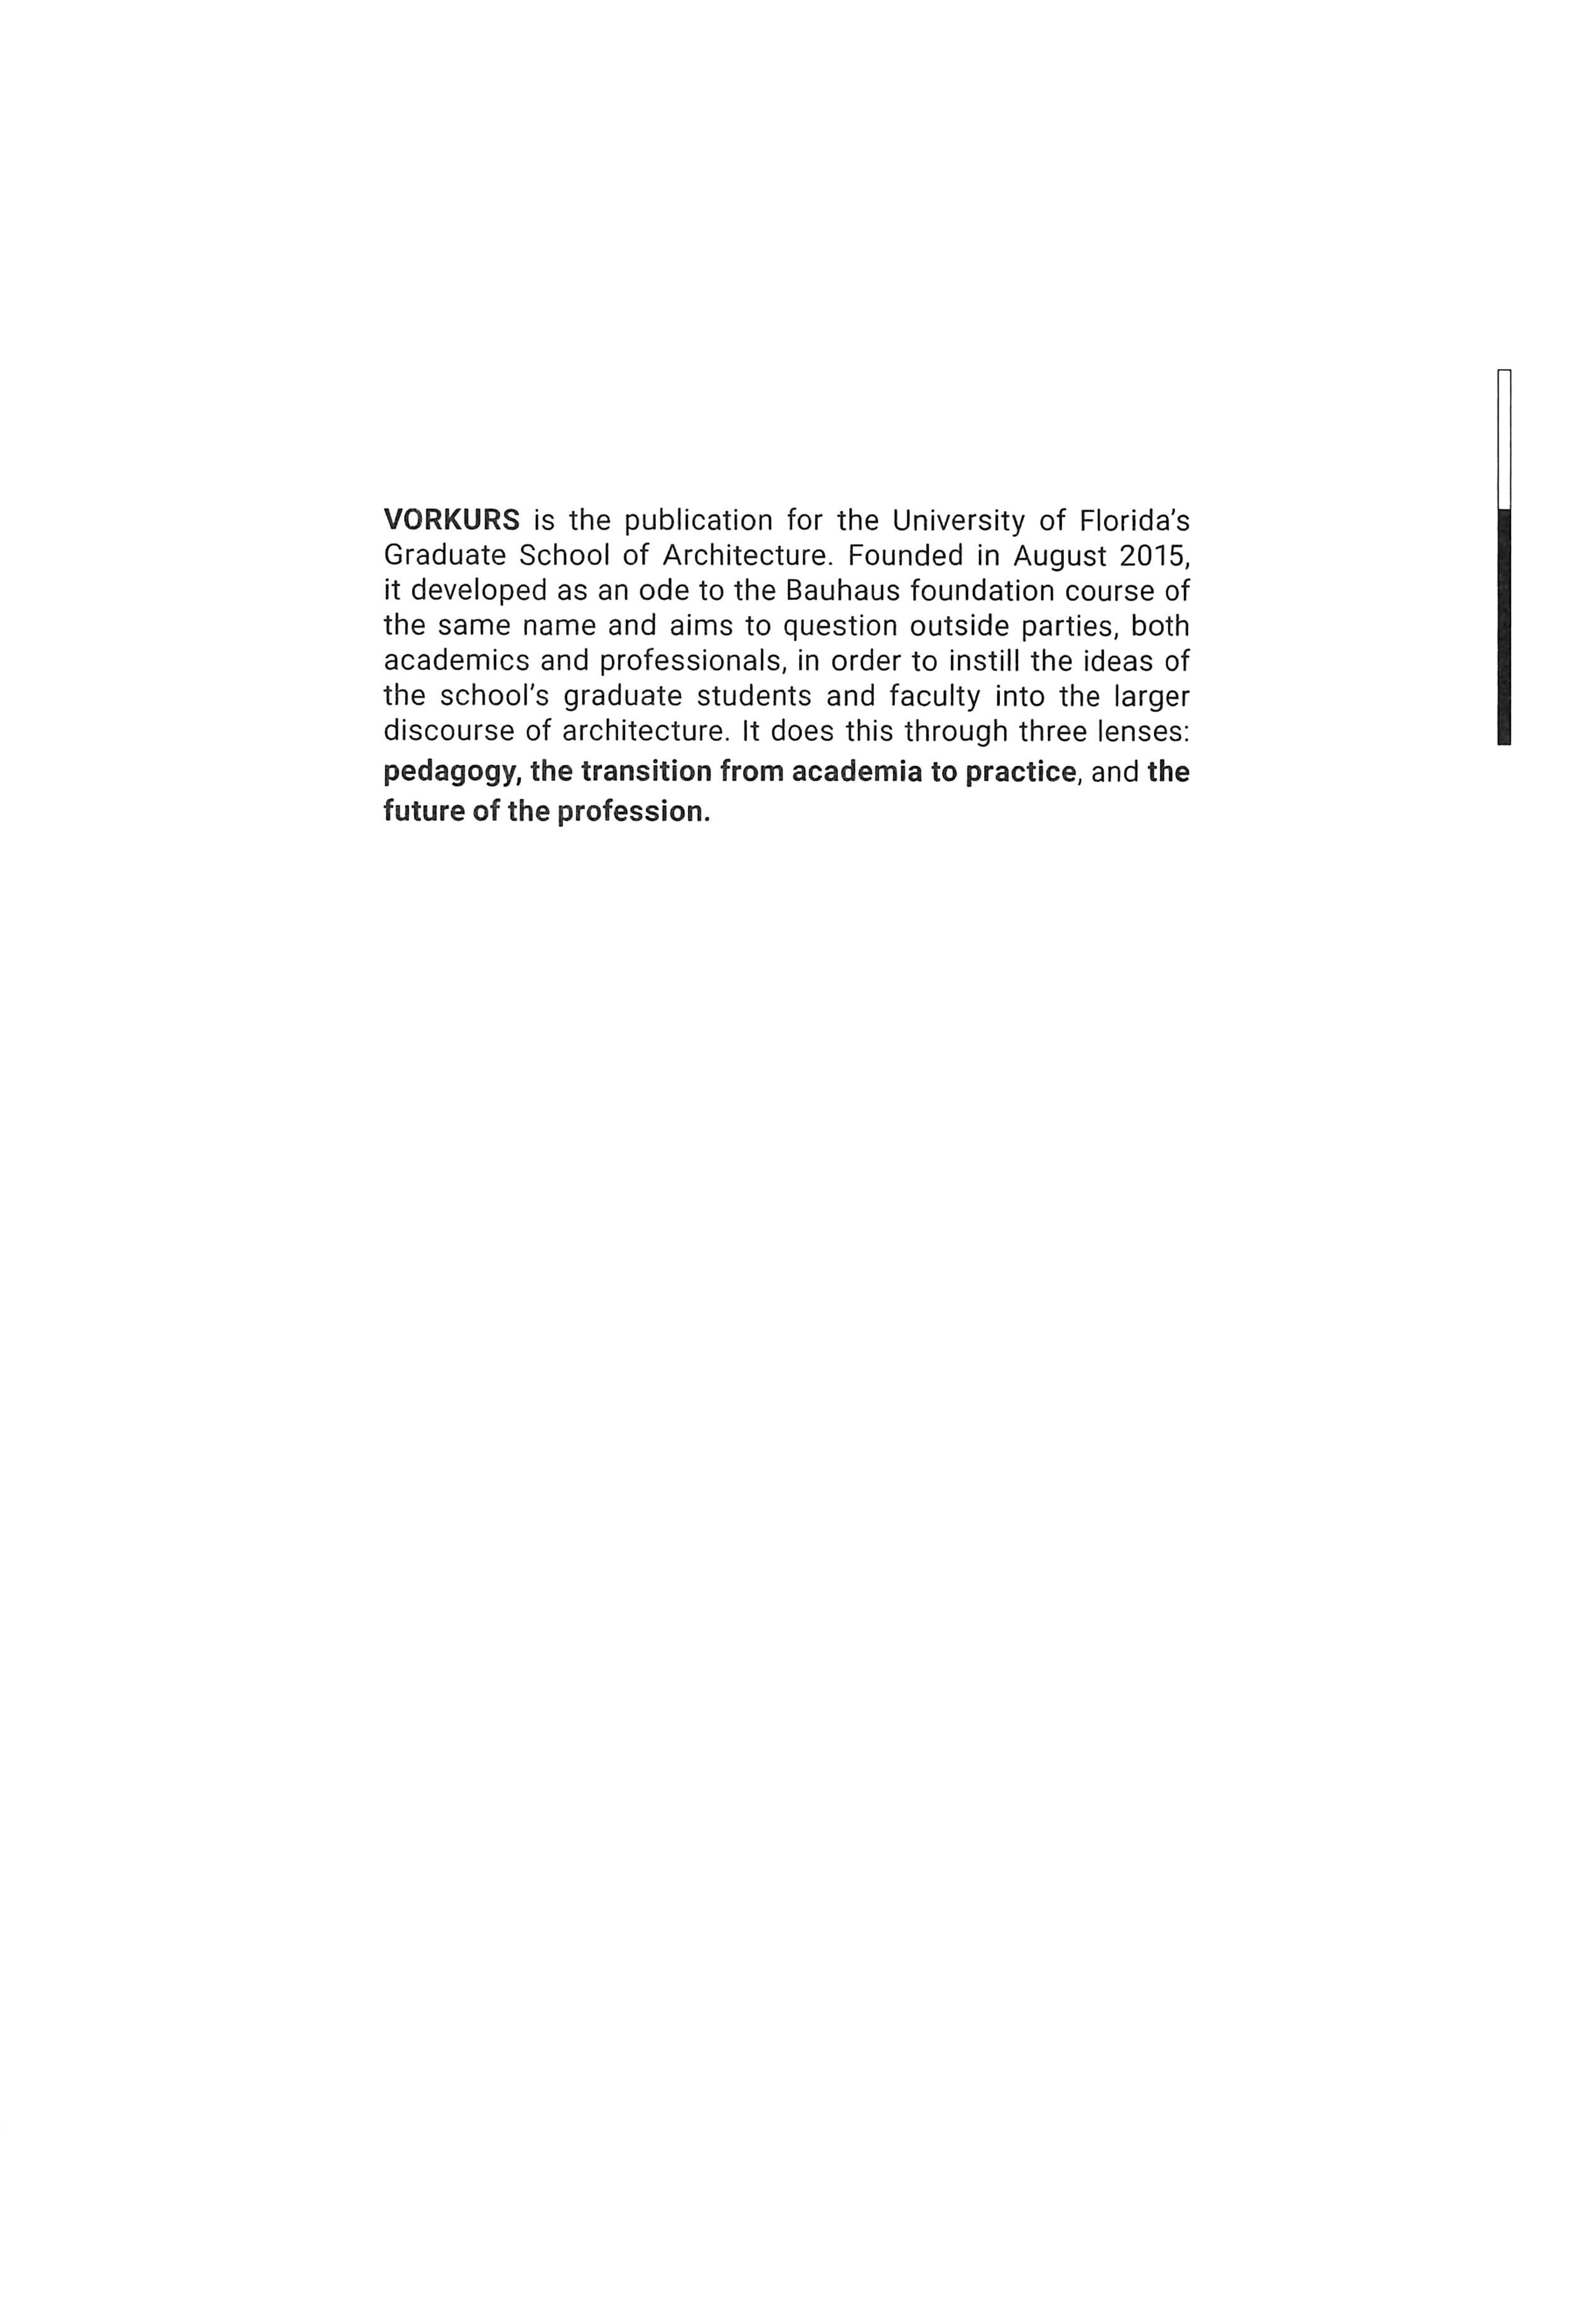 Vorkurs_Exquisite Corpse_Volume 02, University of Florida GSOA, 2018_page 05.jpg